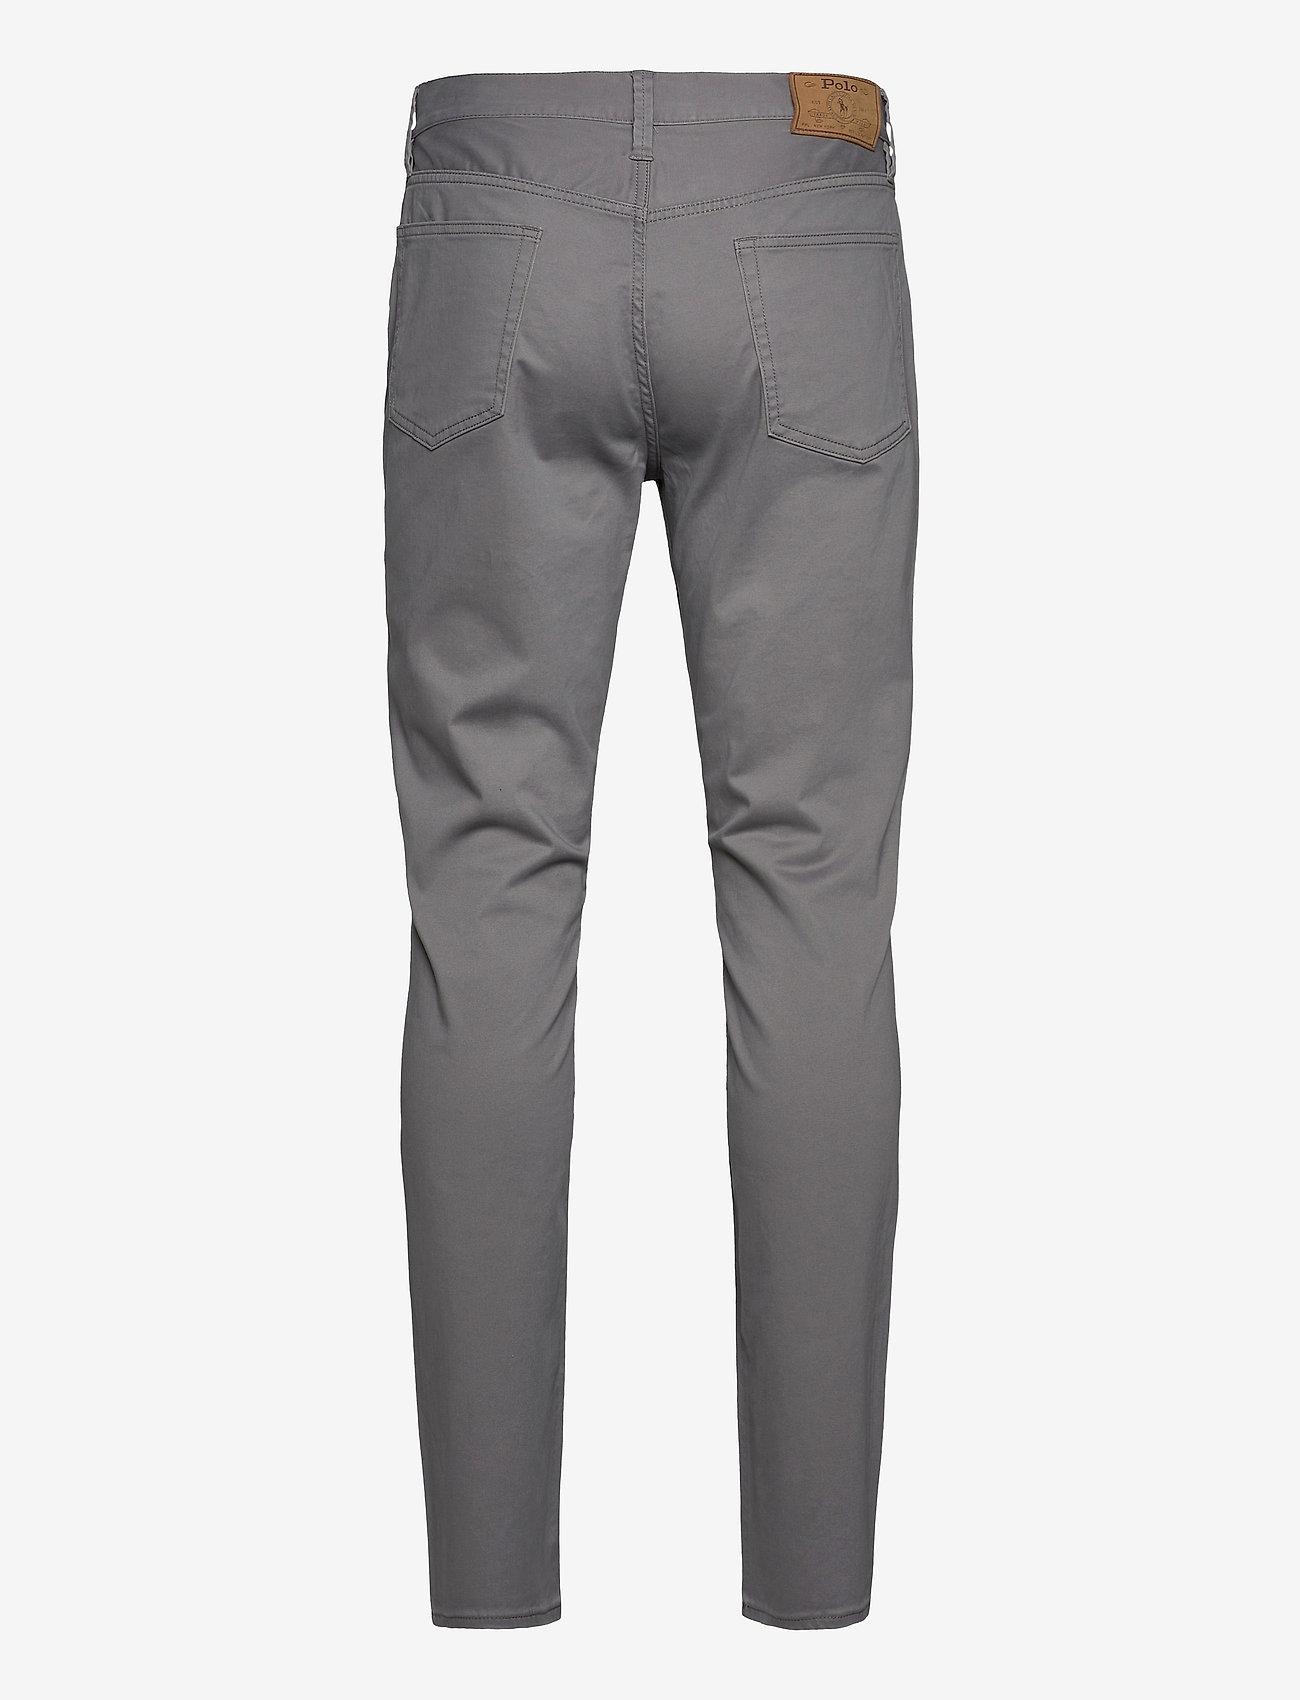 Polo Ralph Lauren - SULLIVAN SLIM - slim jeans - perfect grey - 1